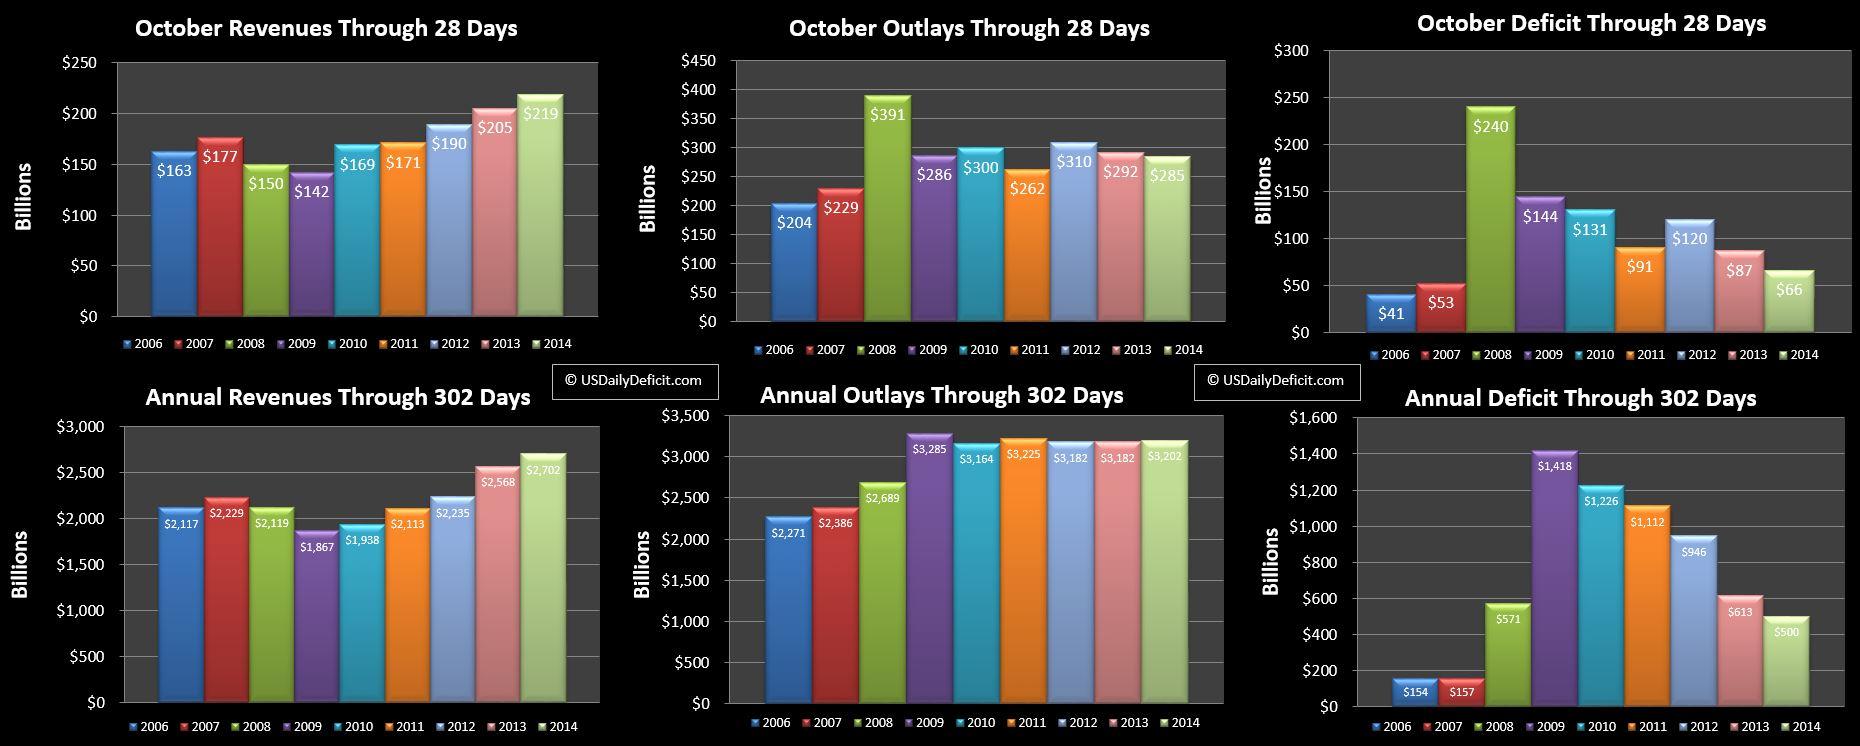 2014-10-28 USDD